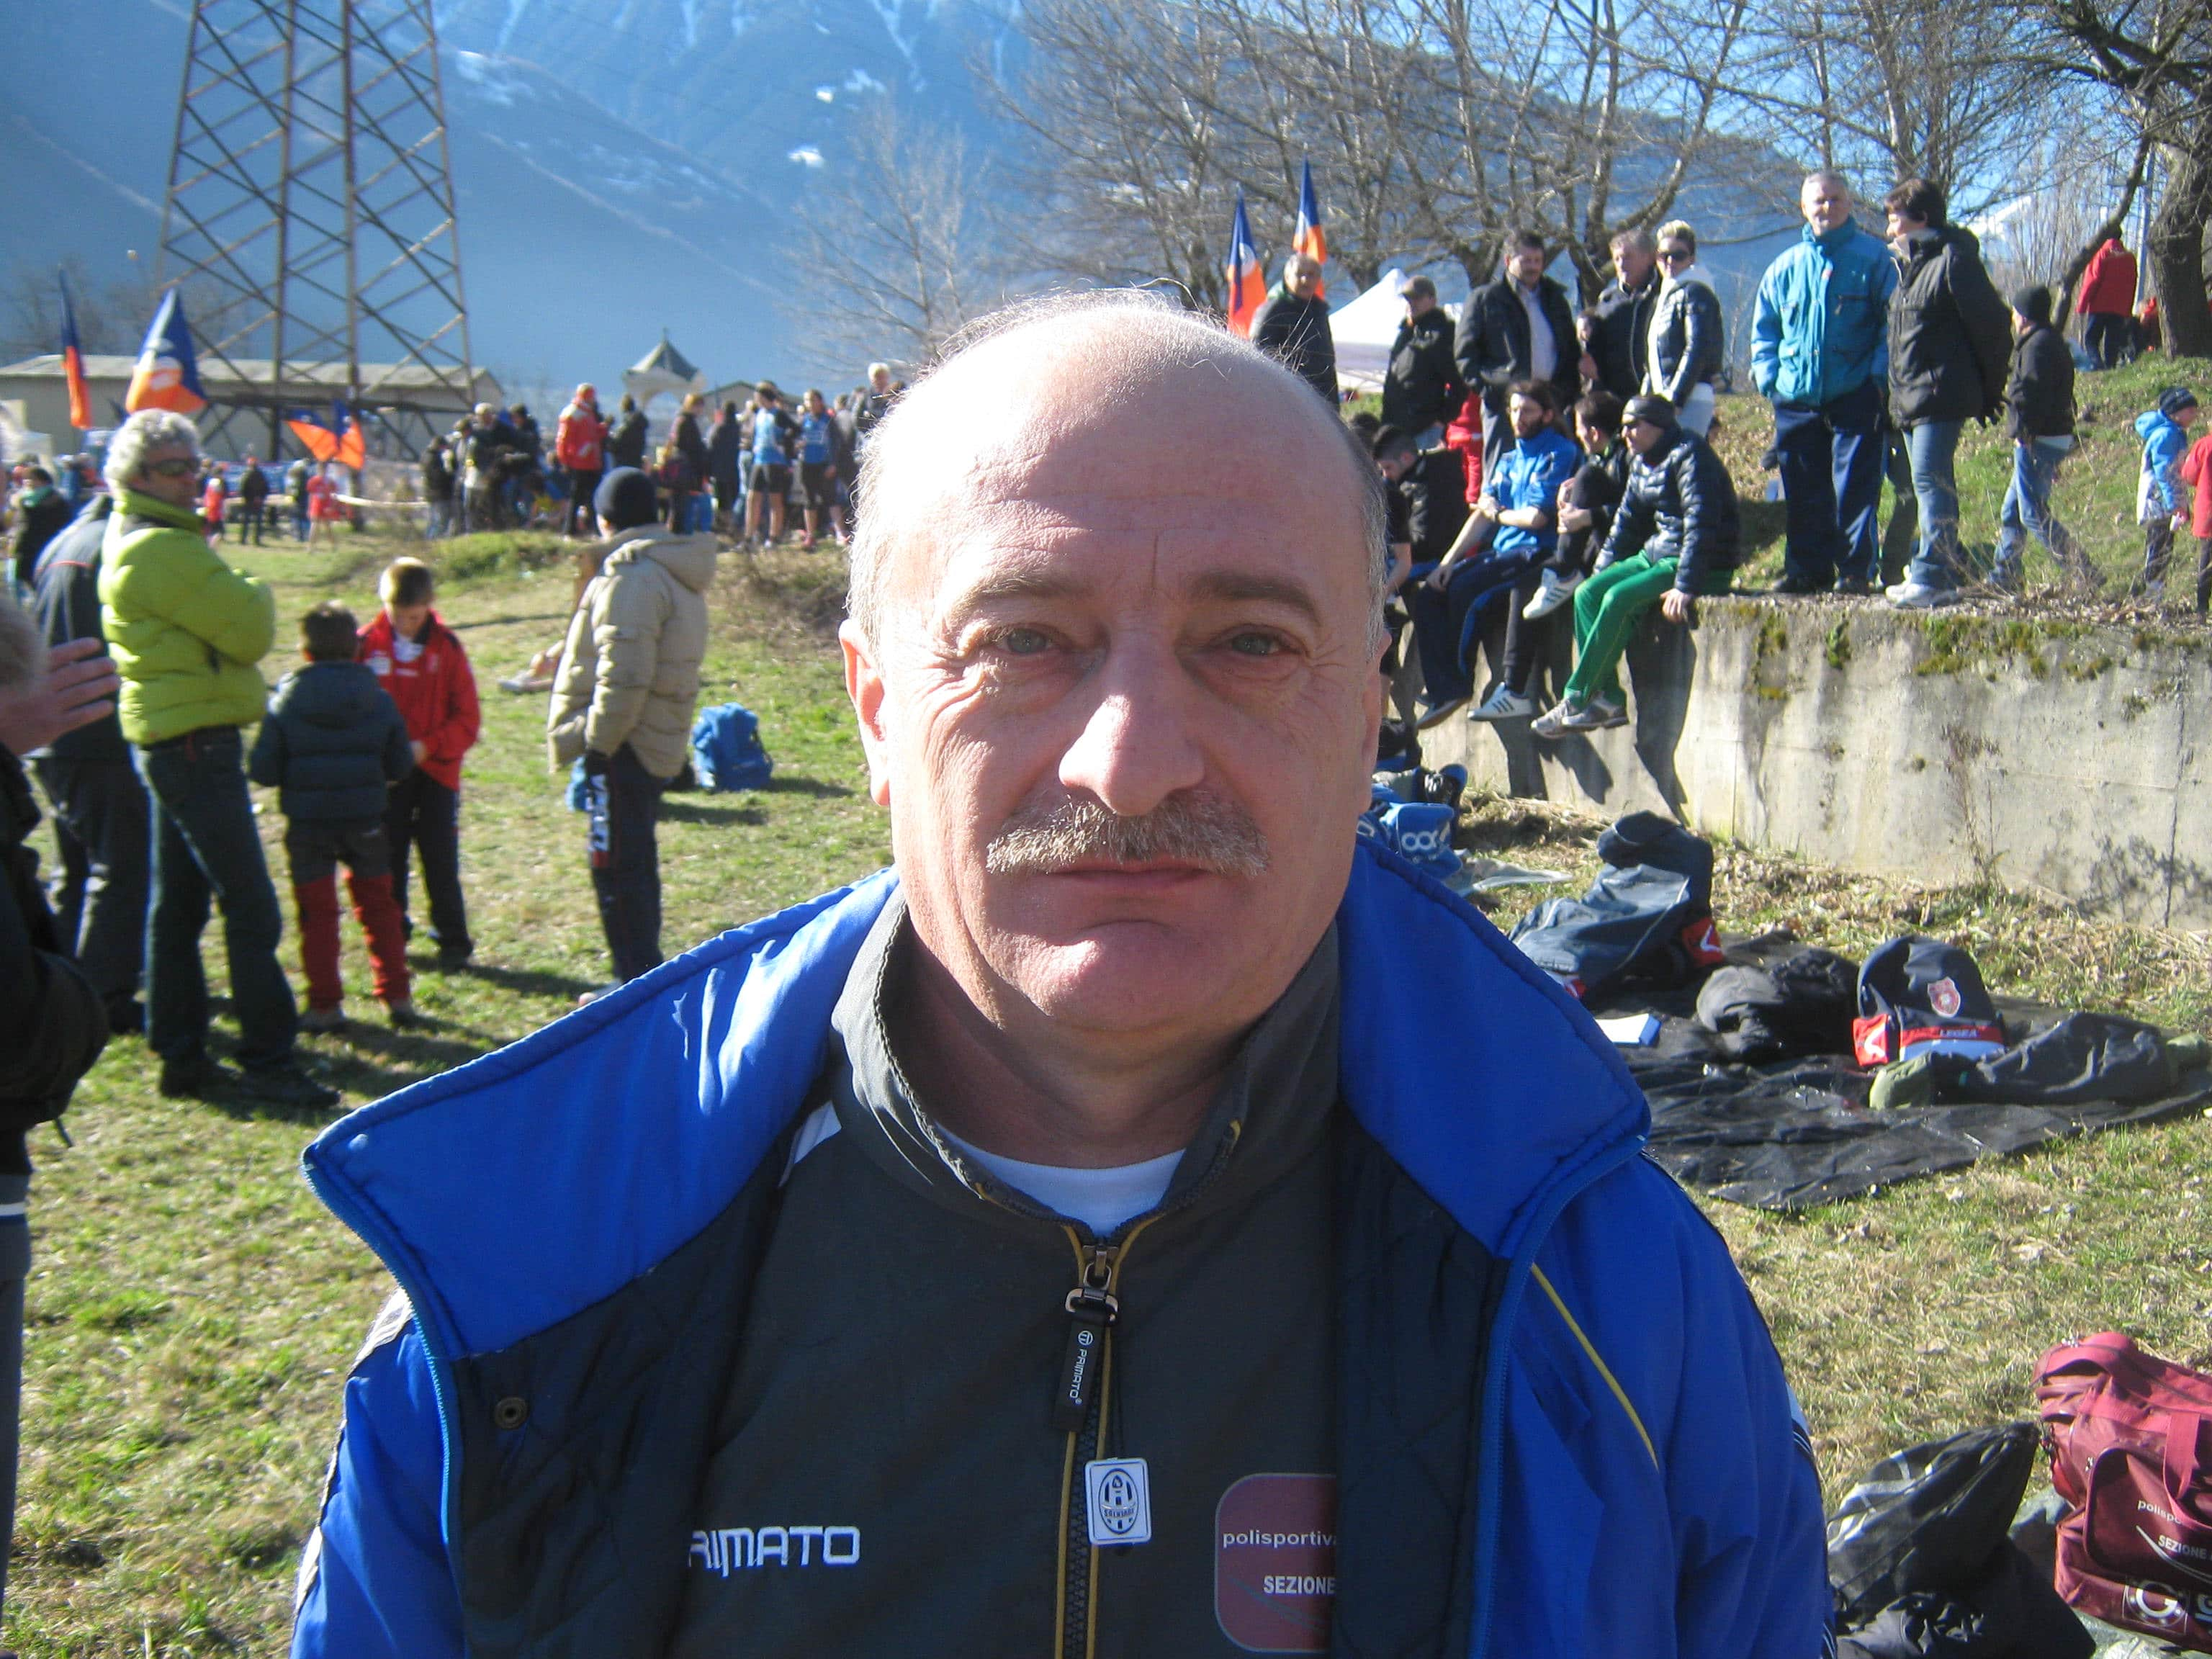 MARIO BUZZELLA